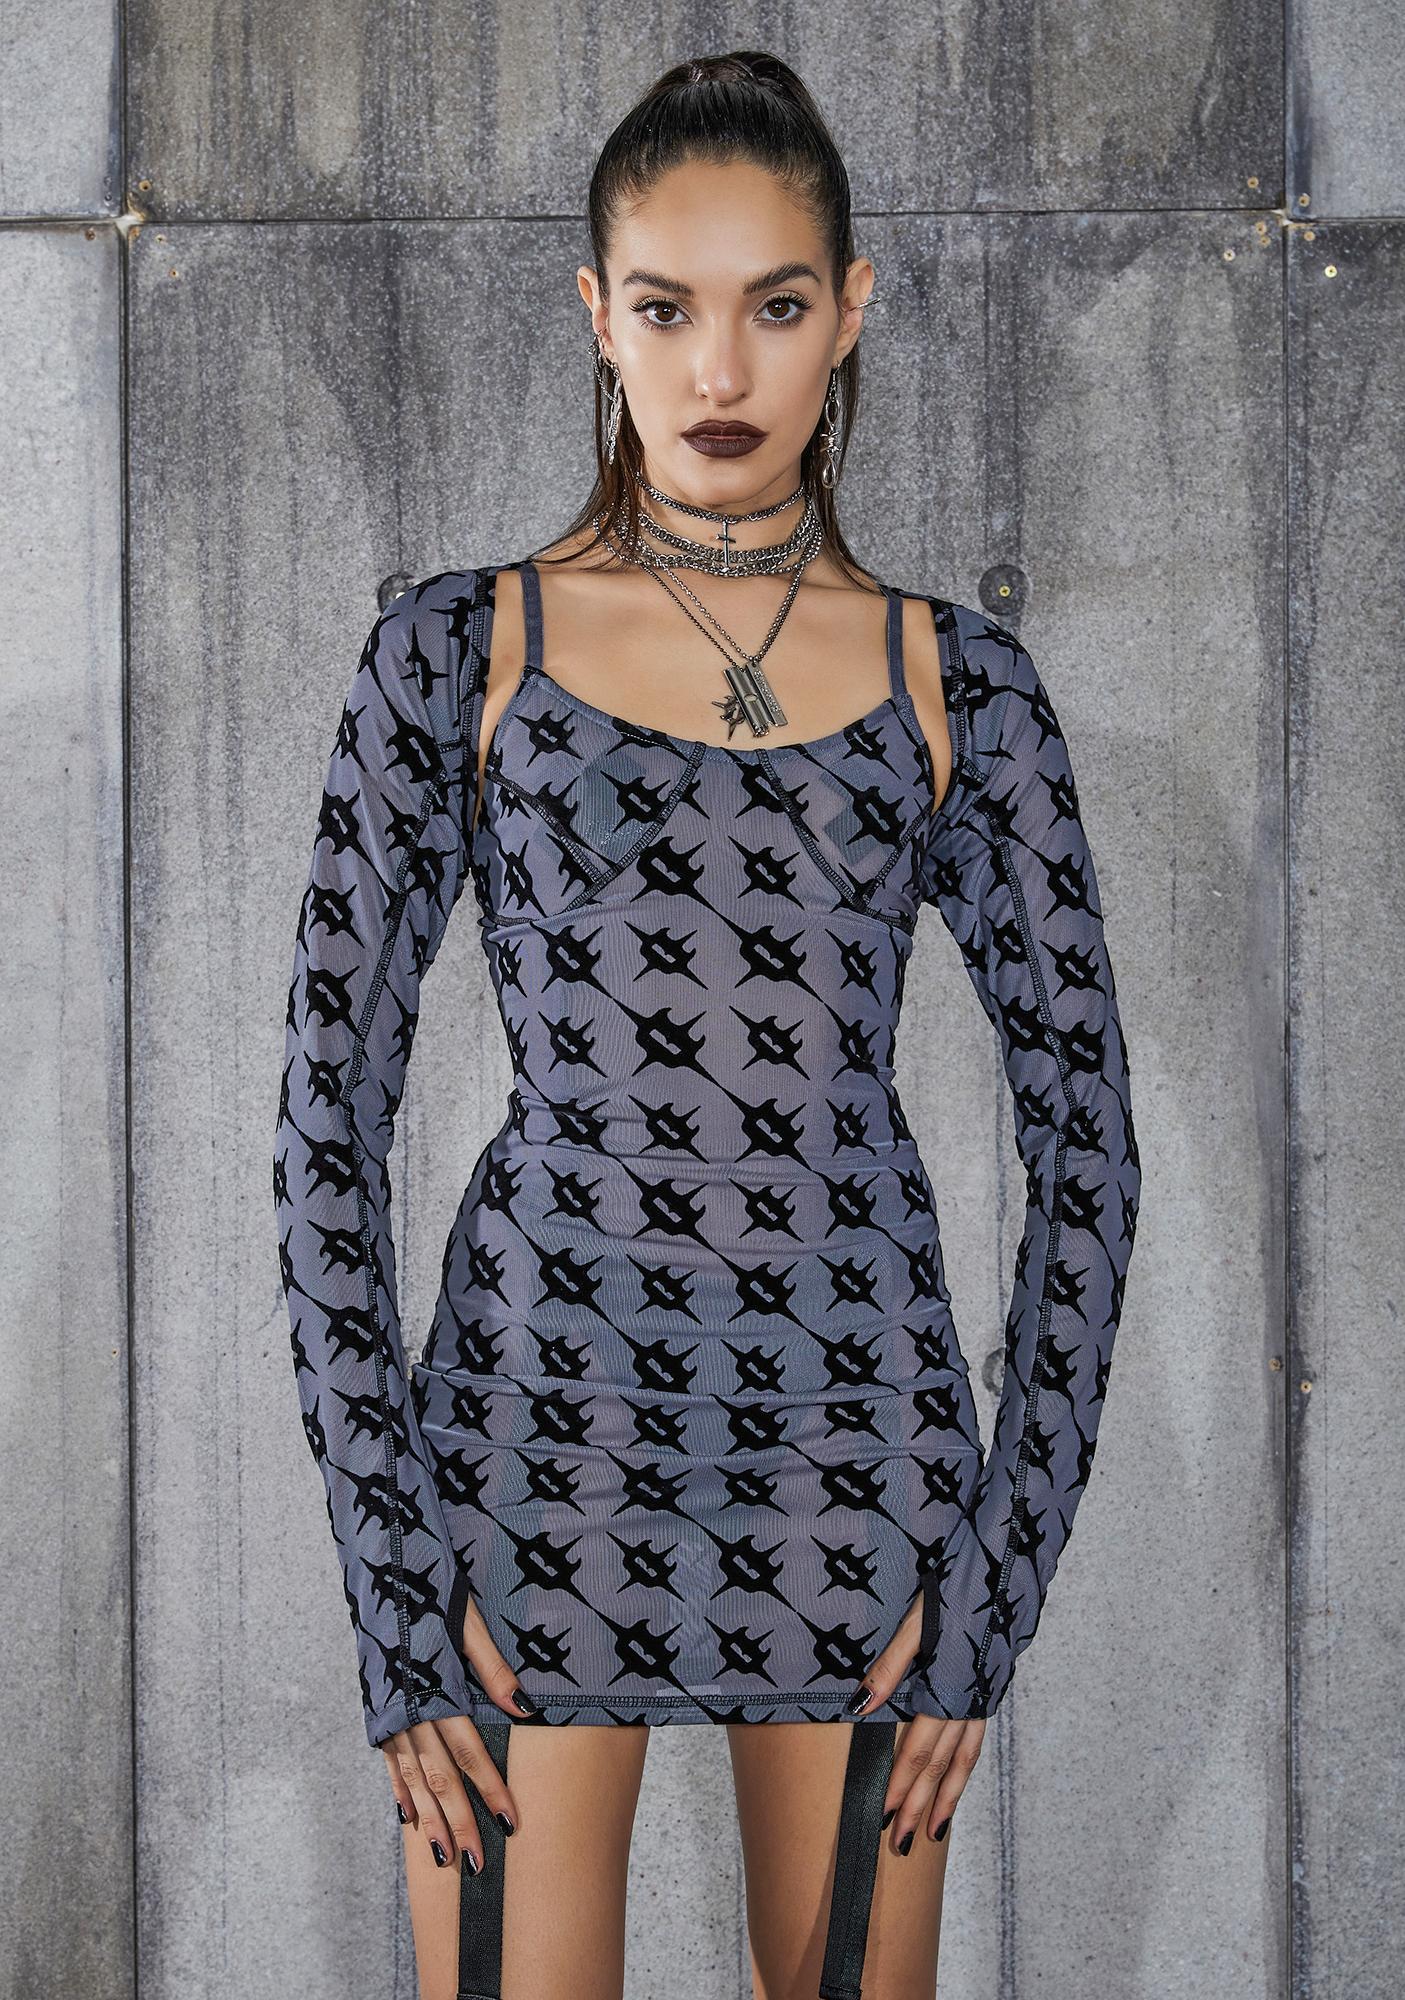 DARKER WAVS Snare Monogram Print Mesh Dress And Shrug Set